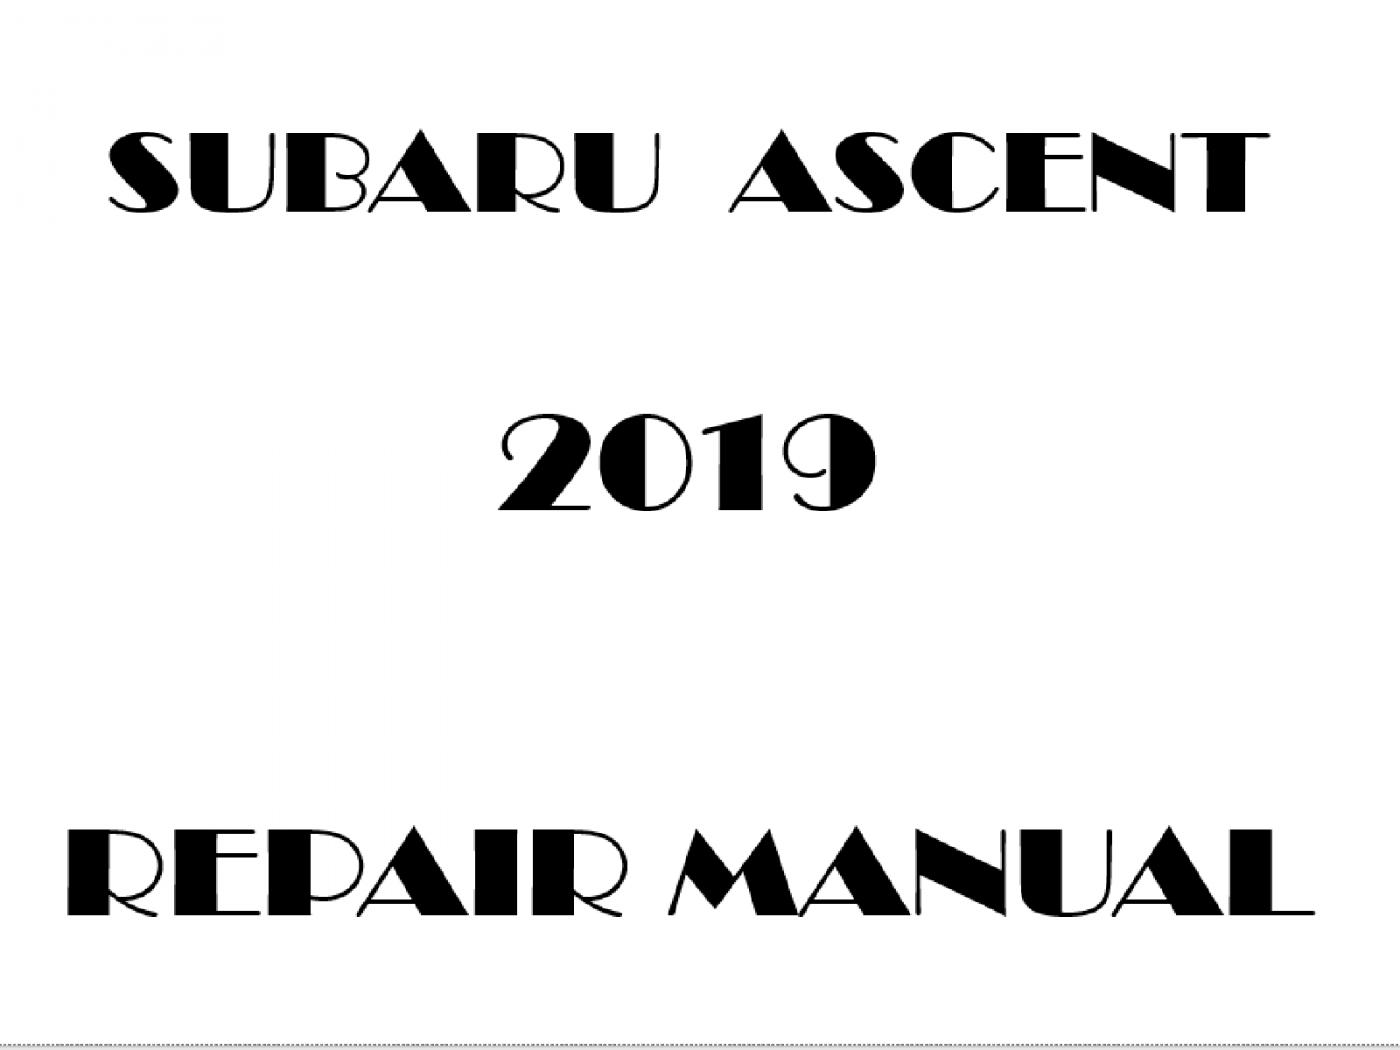 2019 Subaru Ascent repair manual